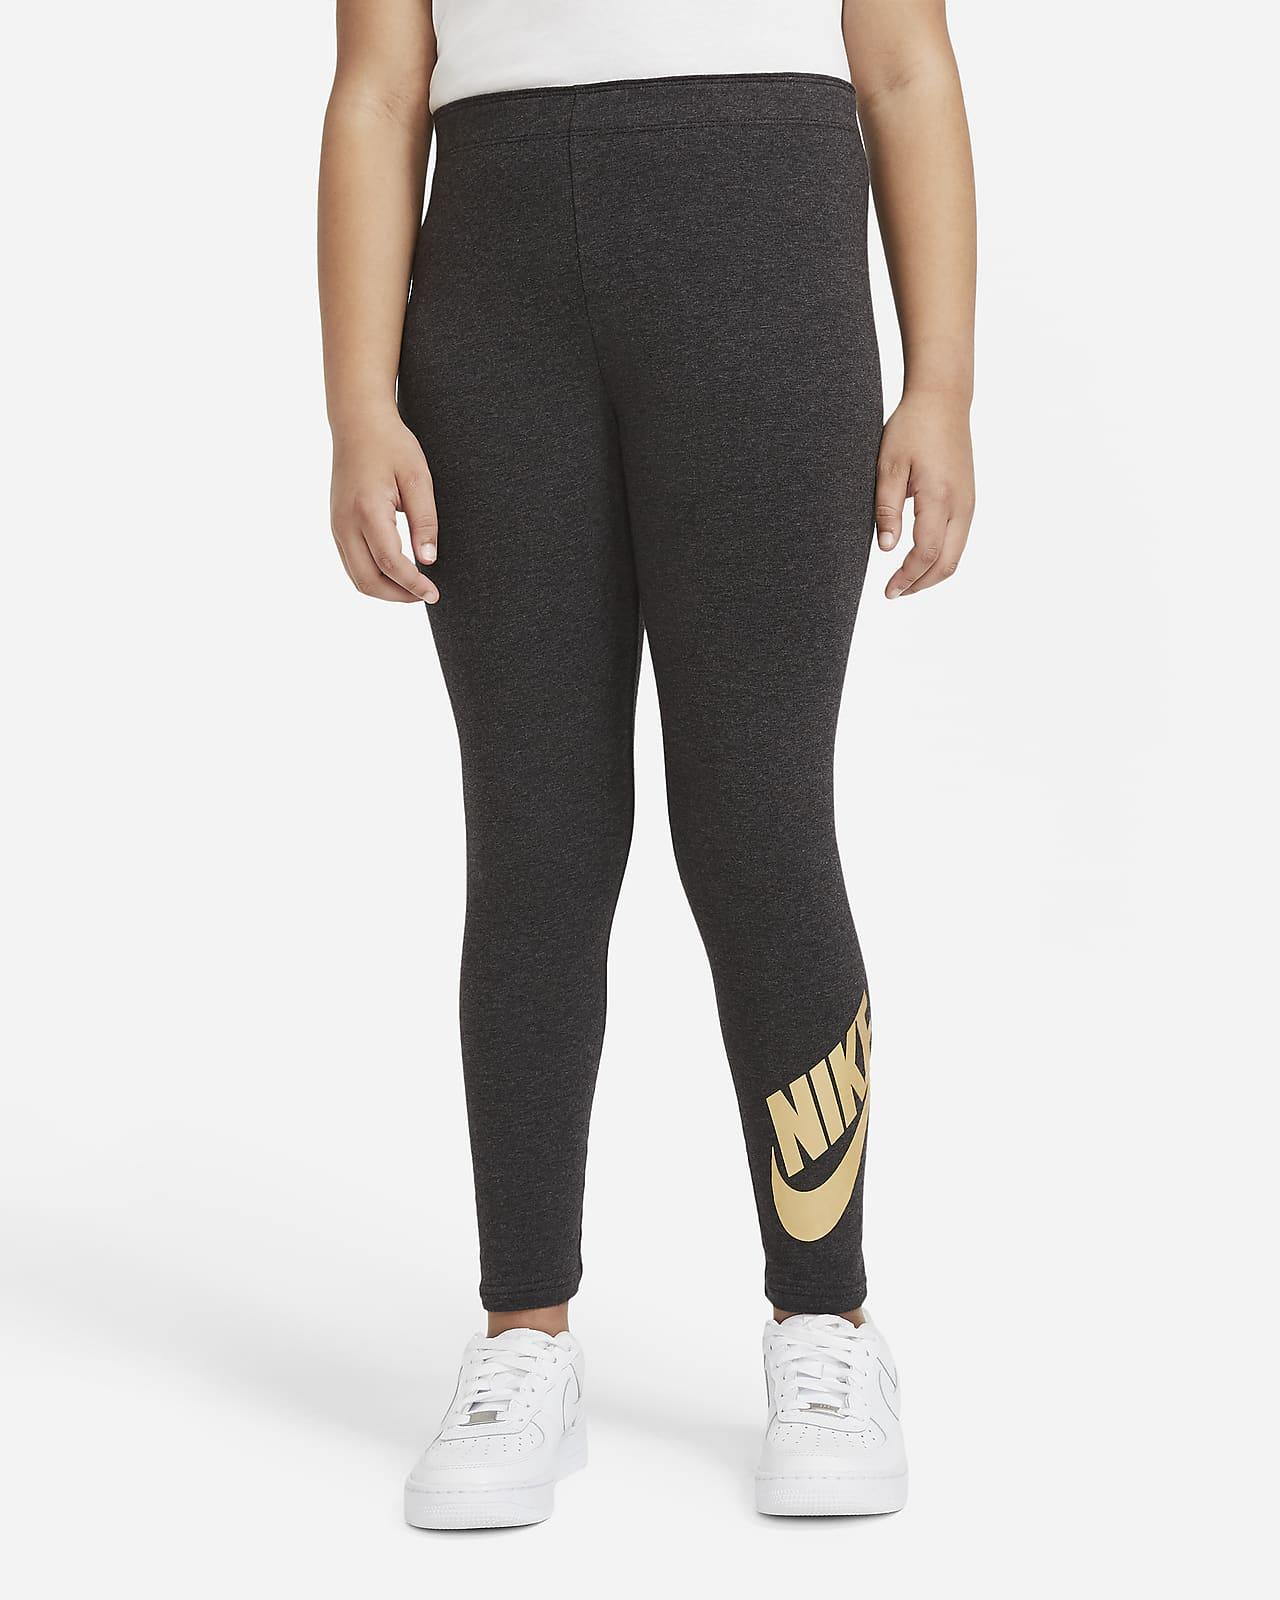 Leggings para niña talla grande (talla extendida) Nike Sportswear Favorite